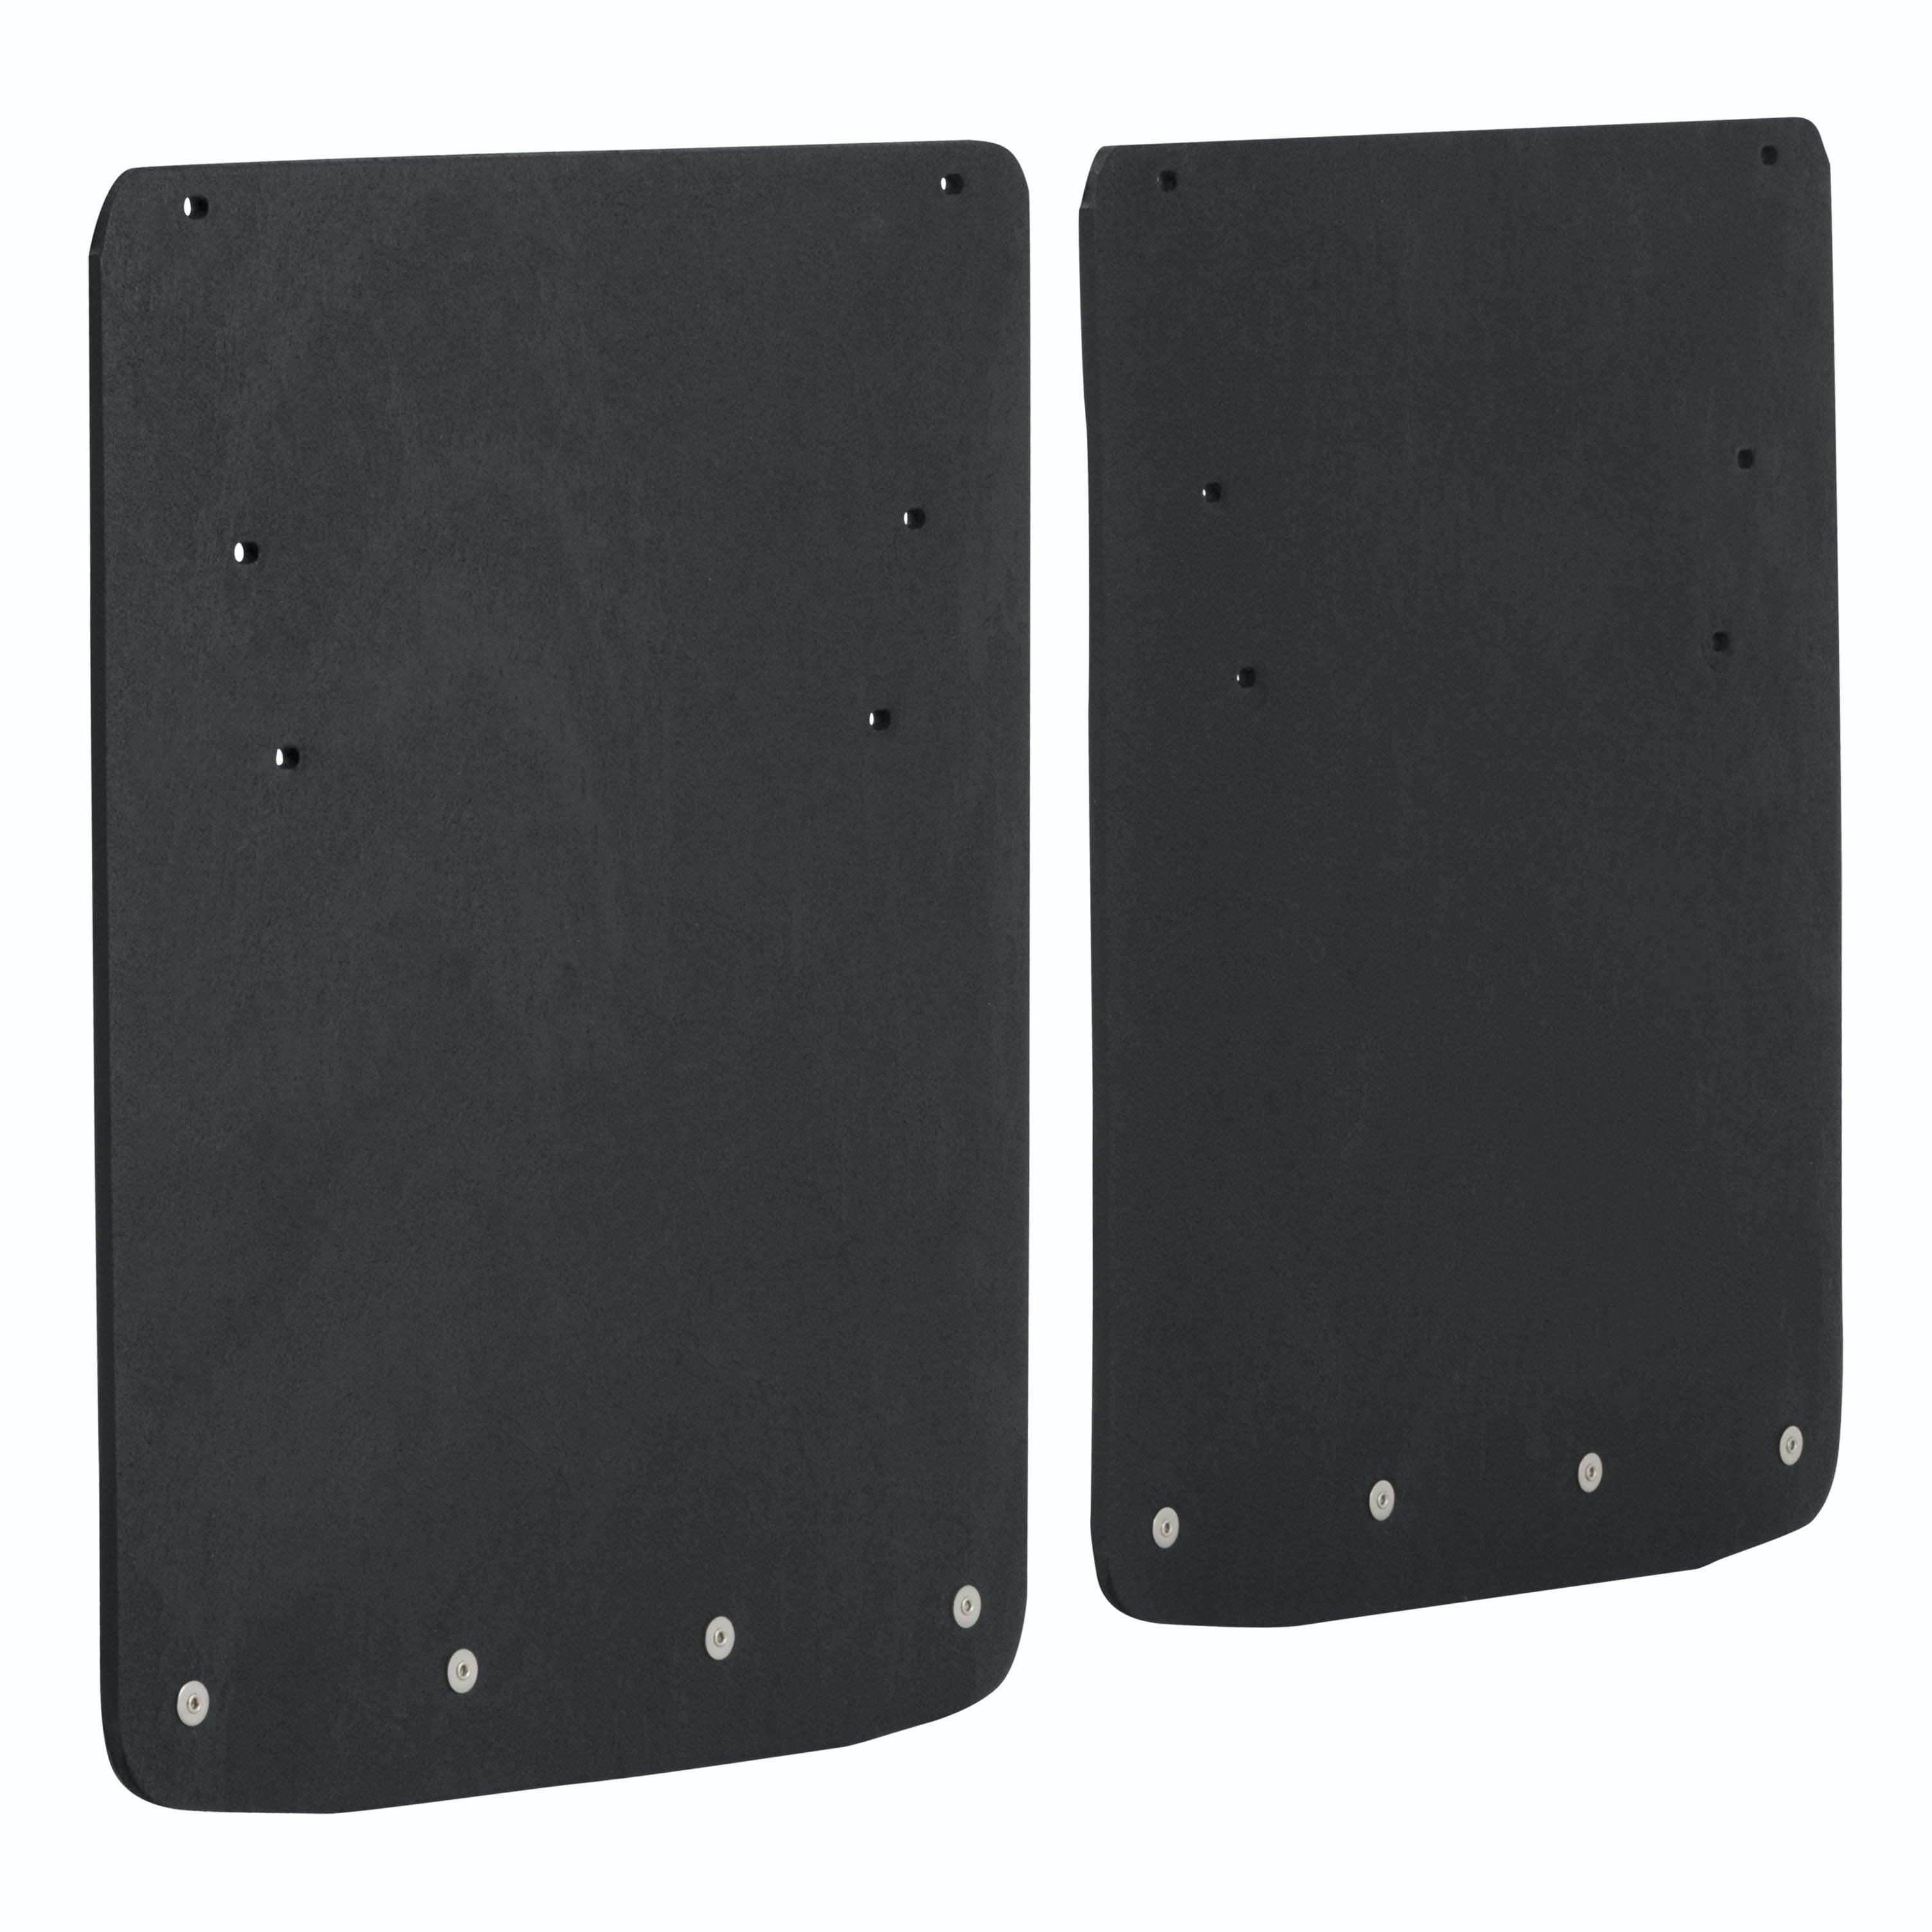 Putco 79504 Stainless Steel Mud Flaps